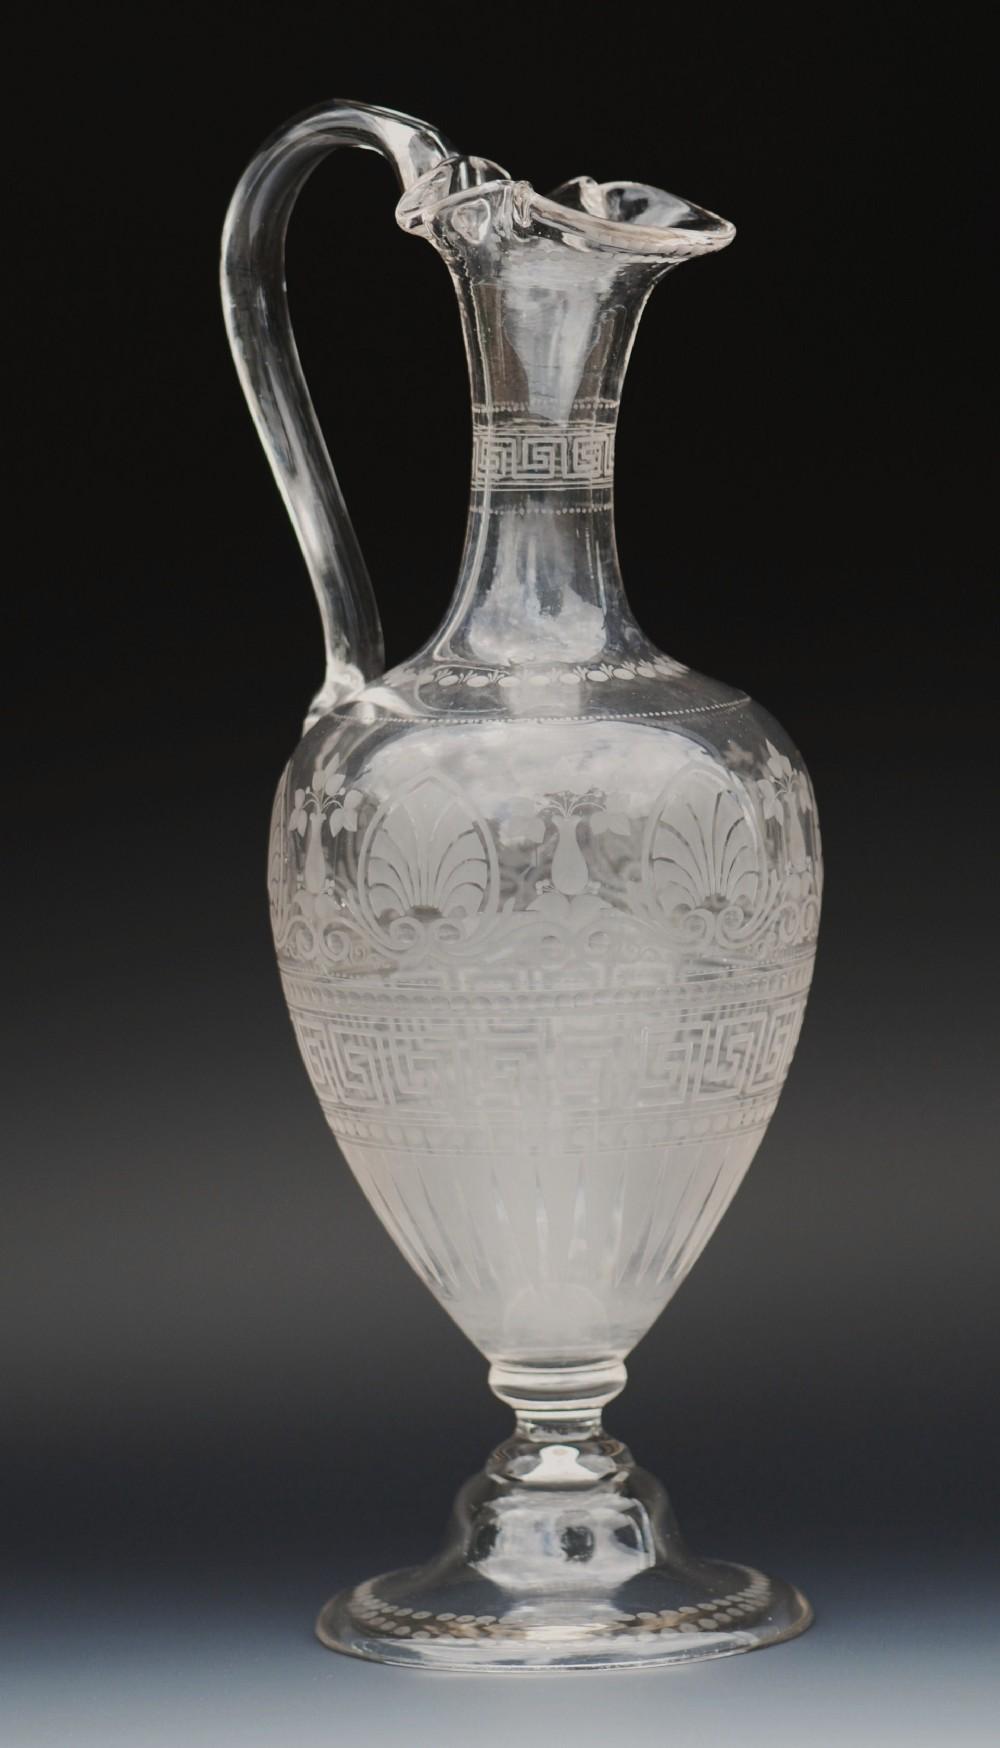 amphora acidetched claret decanter